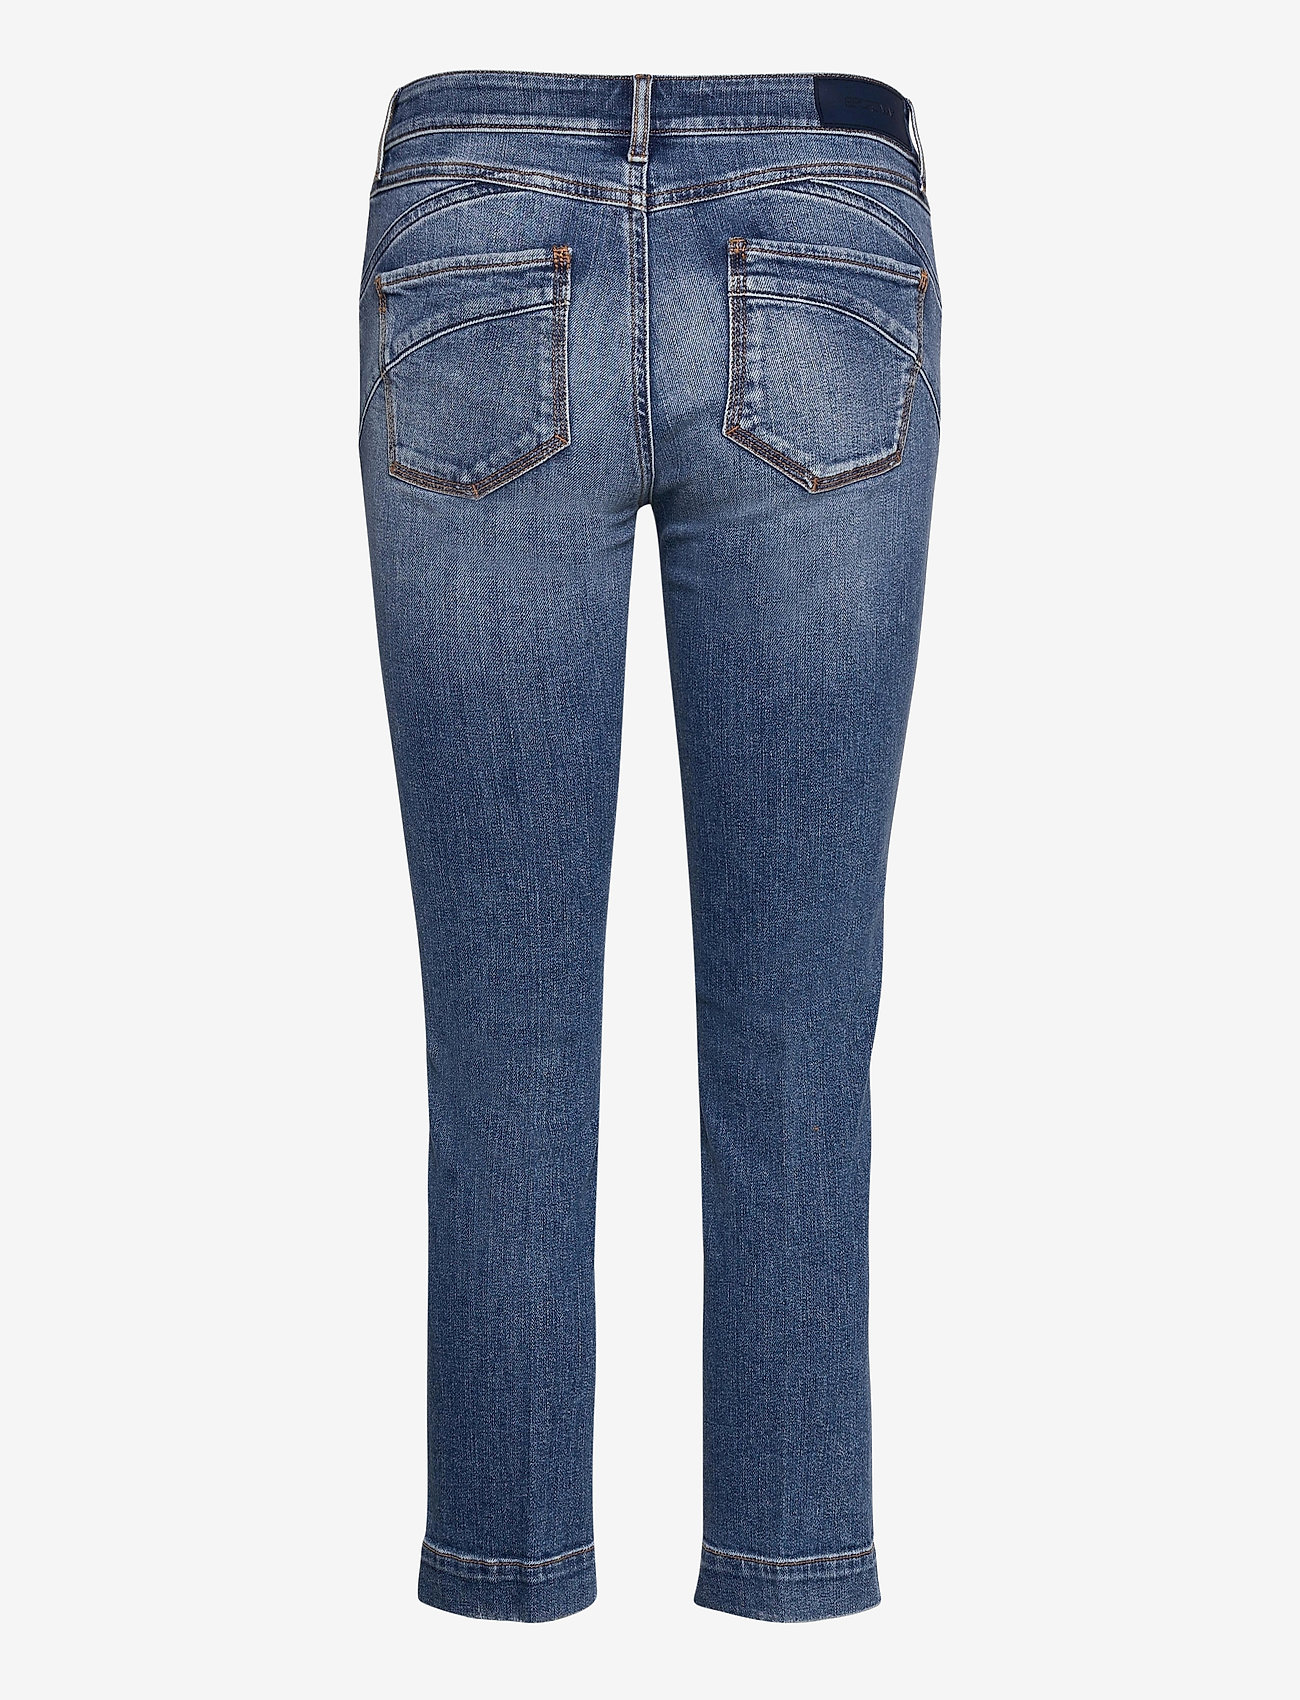 Sportmax - BERMA - slim jeans - midnightblue - 1